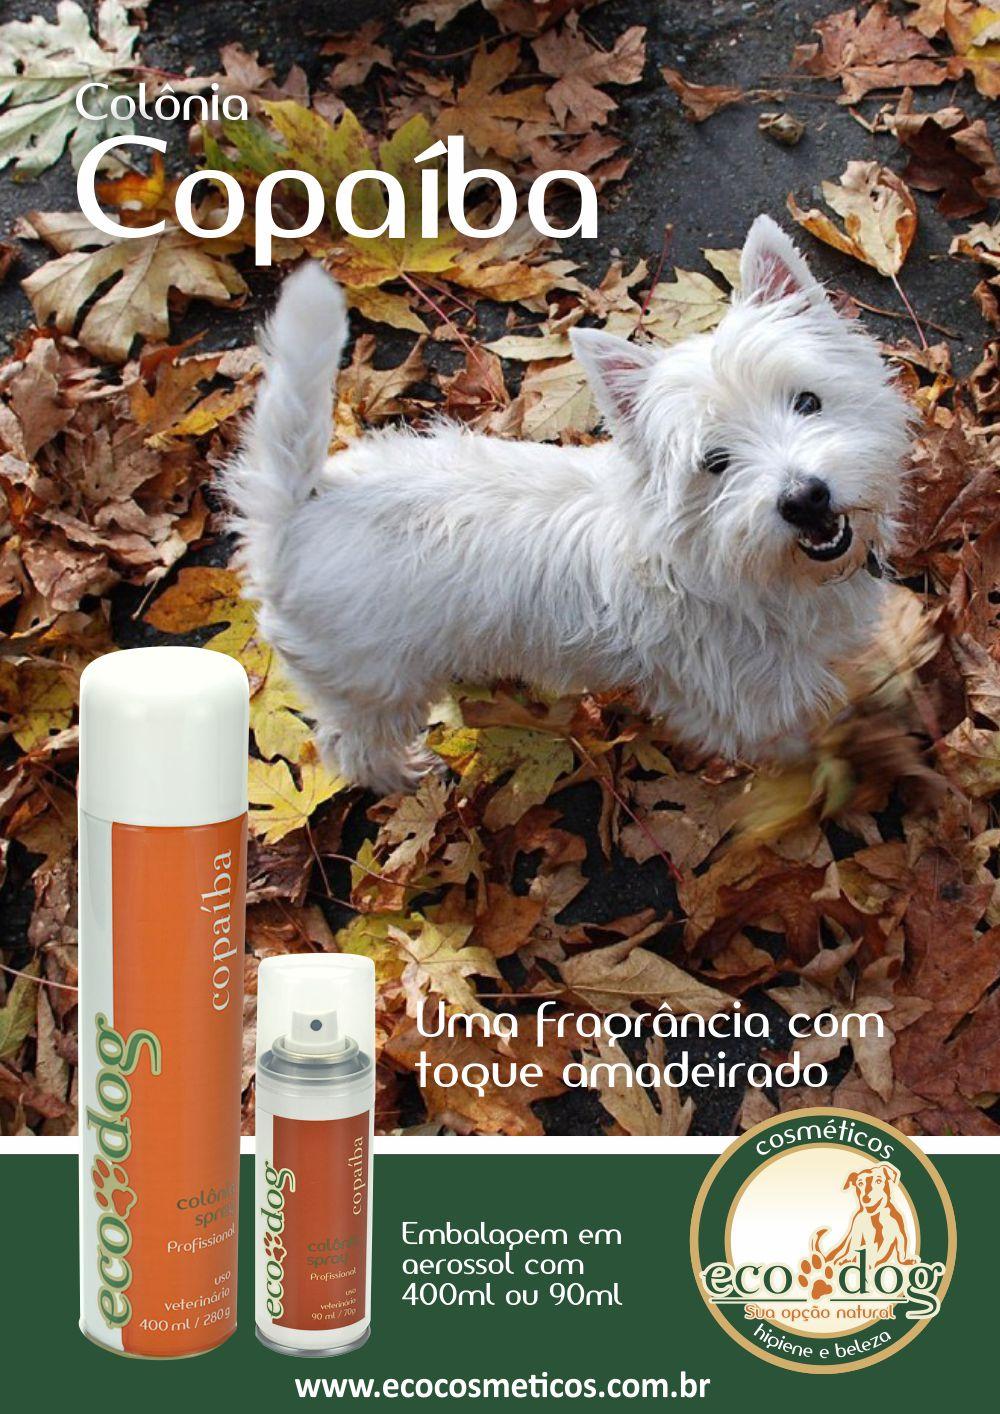 ecodog-poster-copaiba